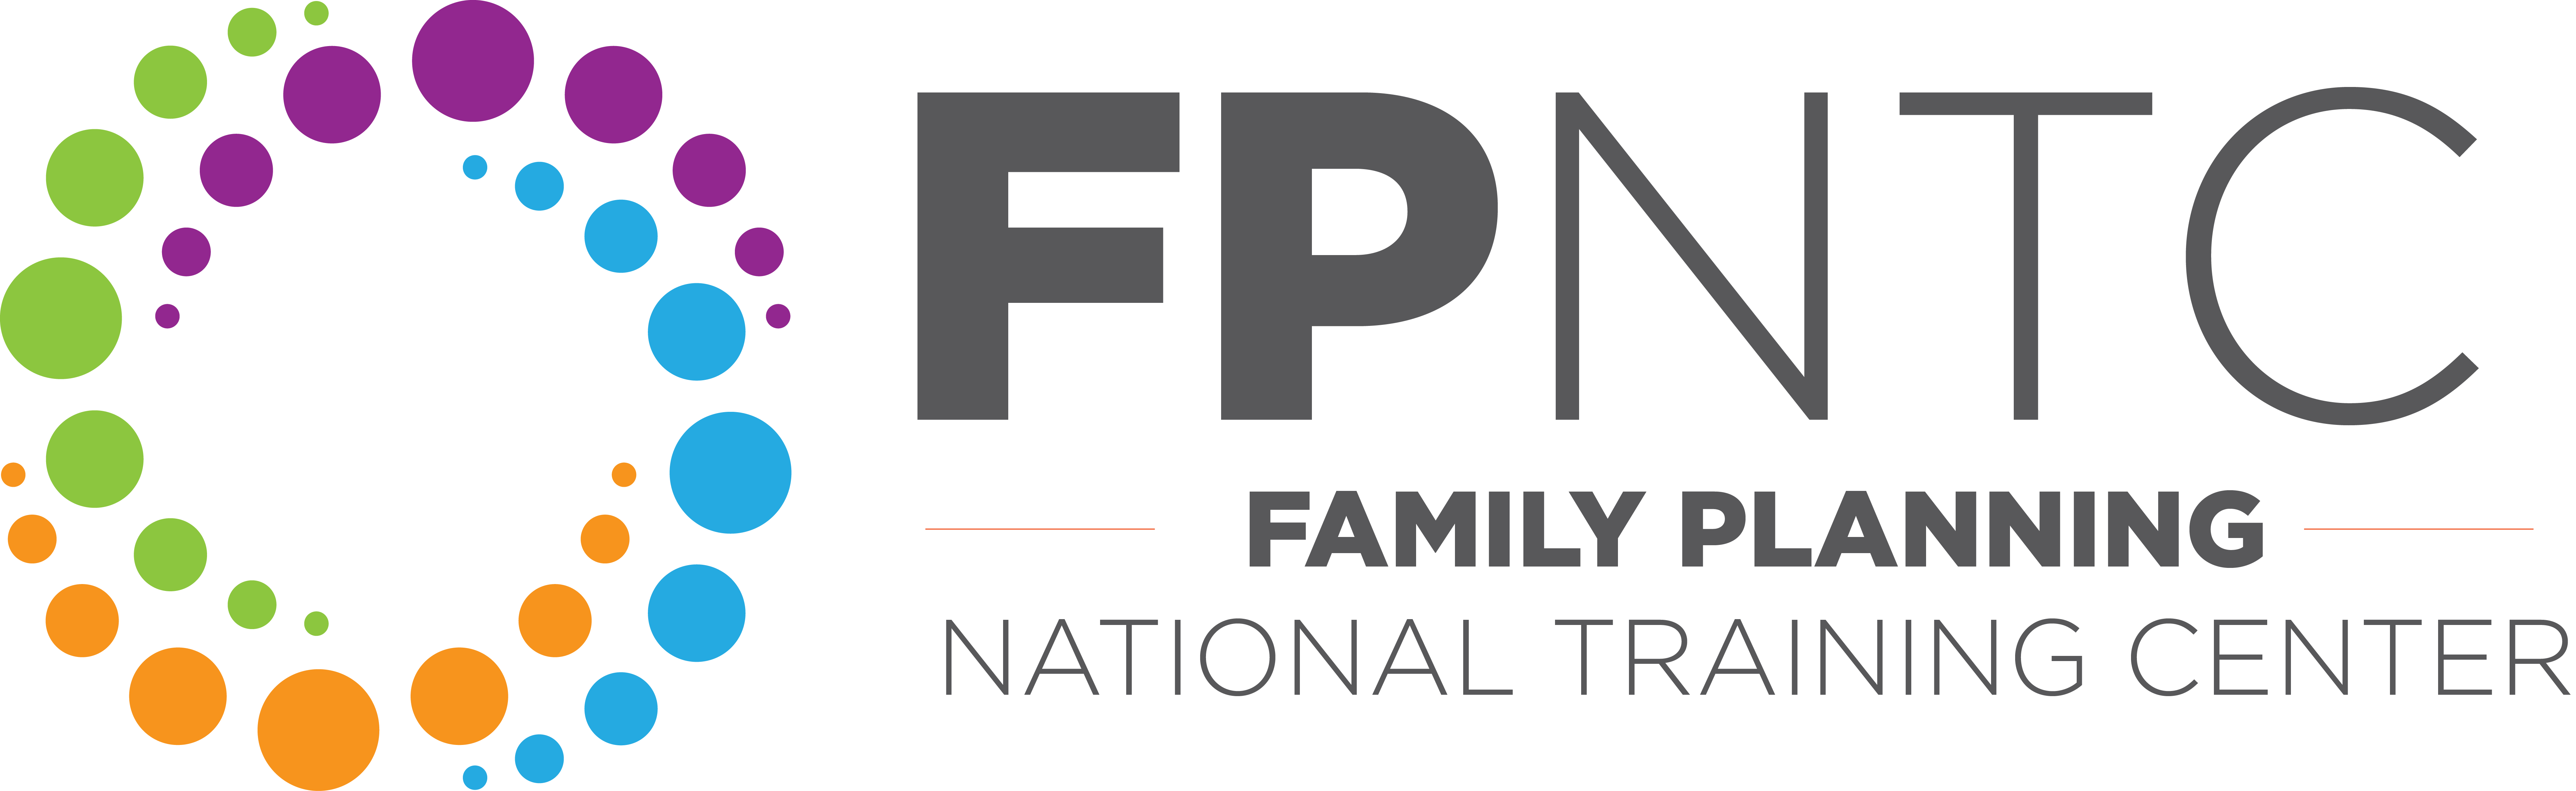 fpntc_logo_horizontal_color (002)